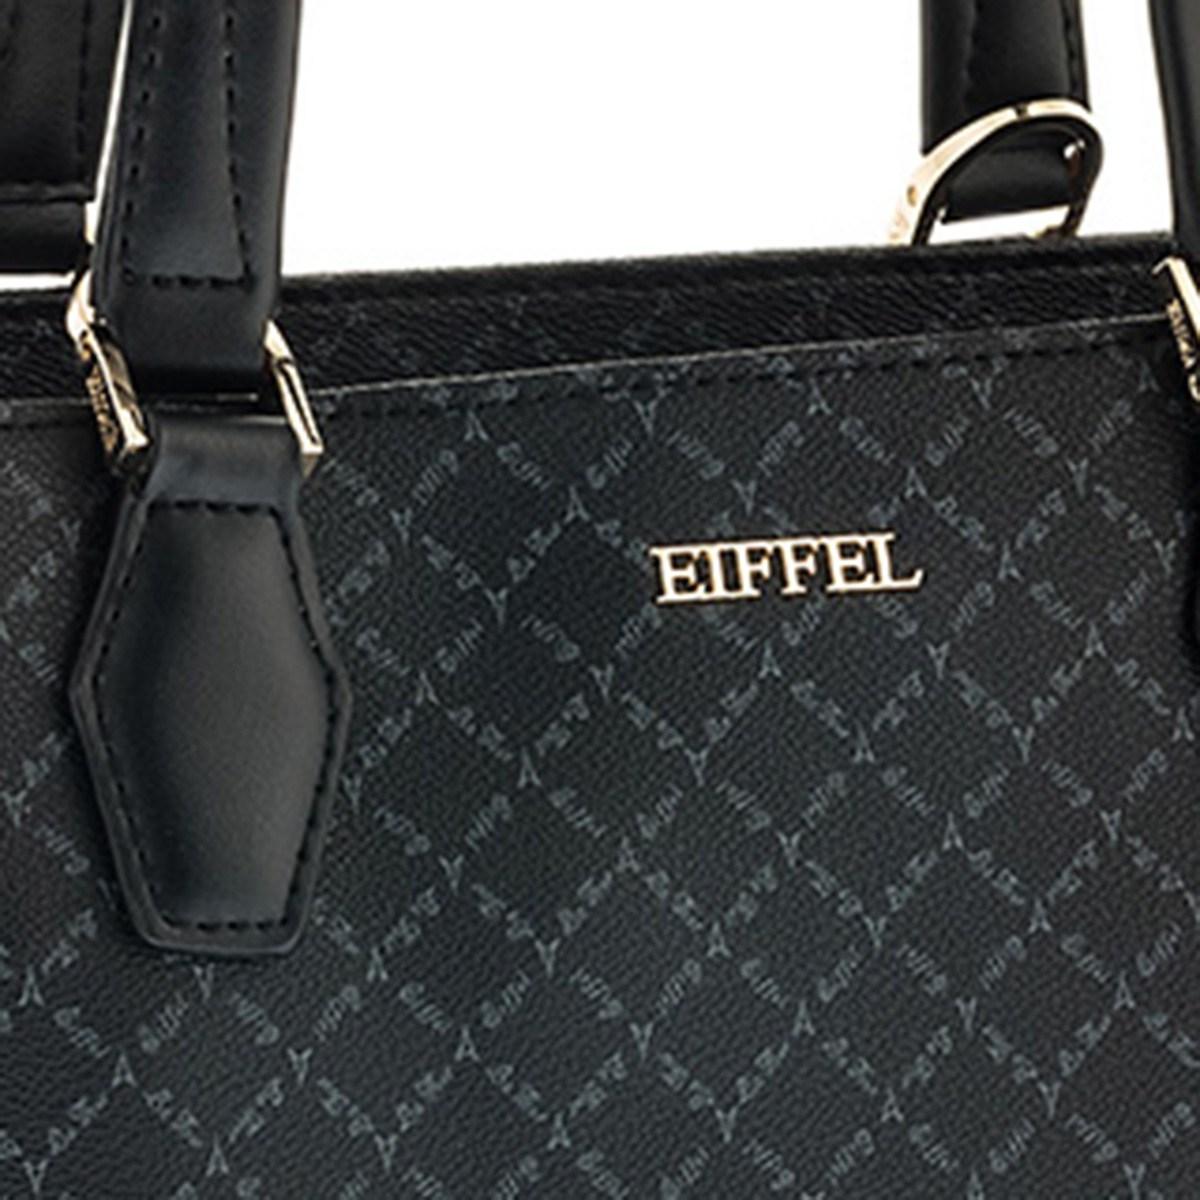 493f7e8e77 Προσφορά Τσάντα Χειρός-Tote La Tour Eiffel Logo-Δέρμα 161016 Μαύρη ...